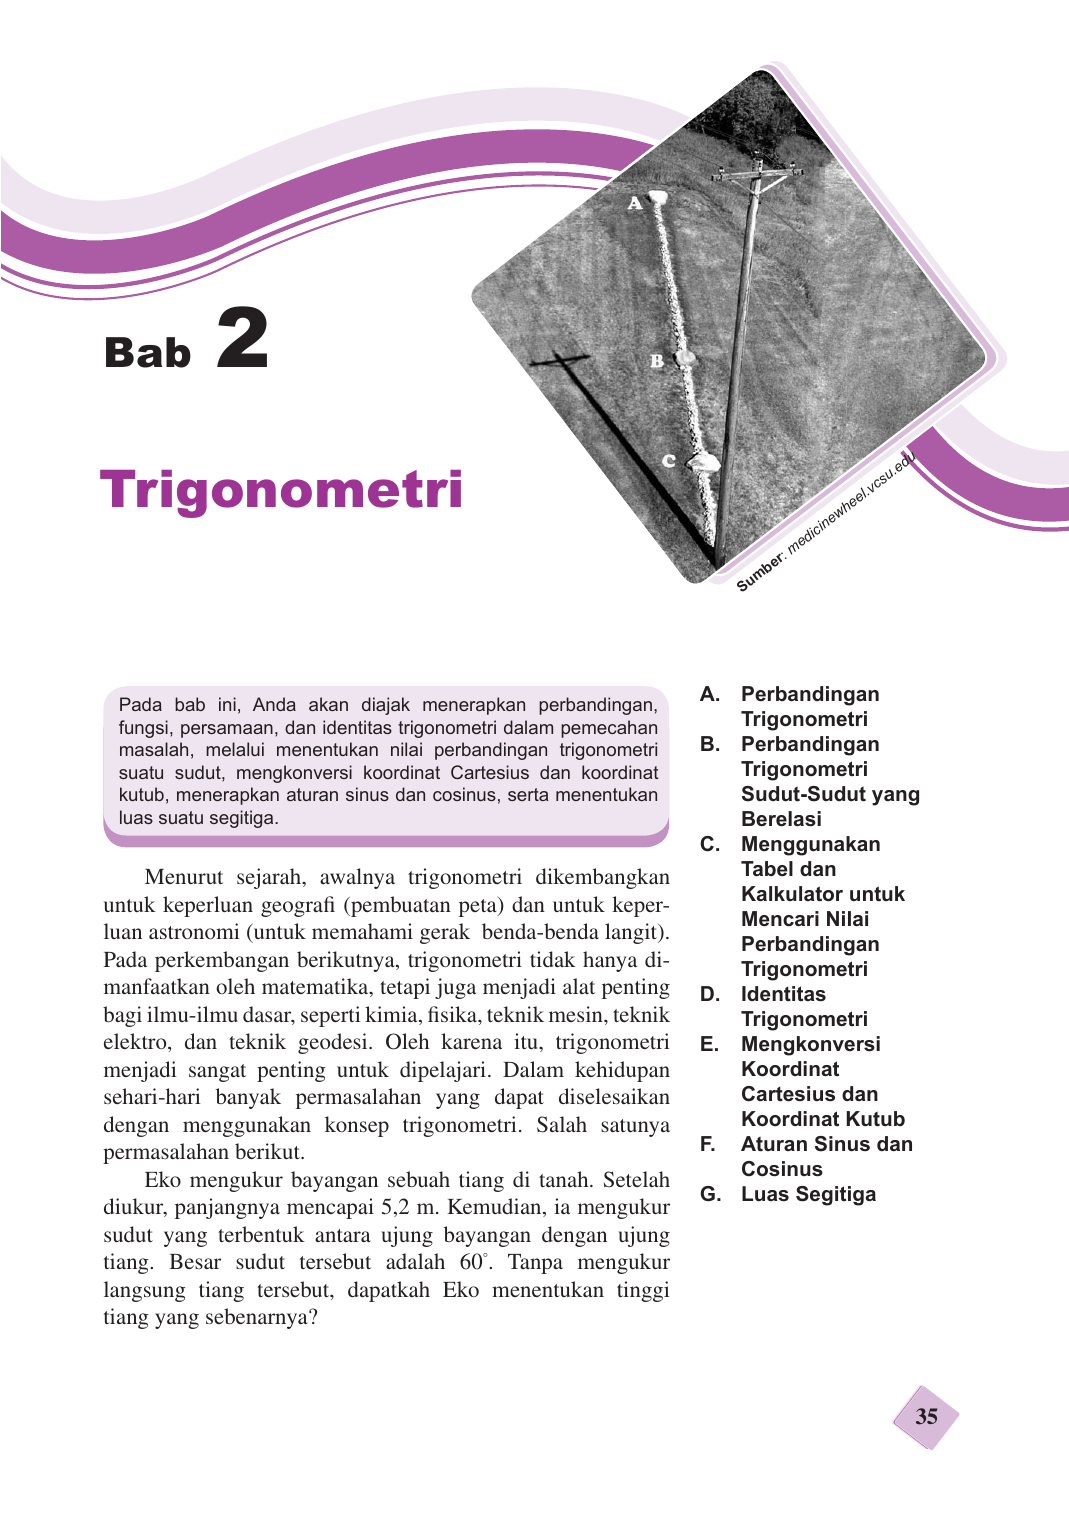 A Perbandingan Trigonometri